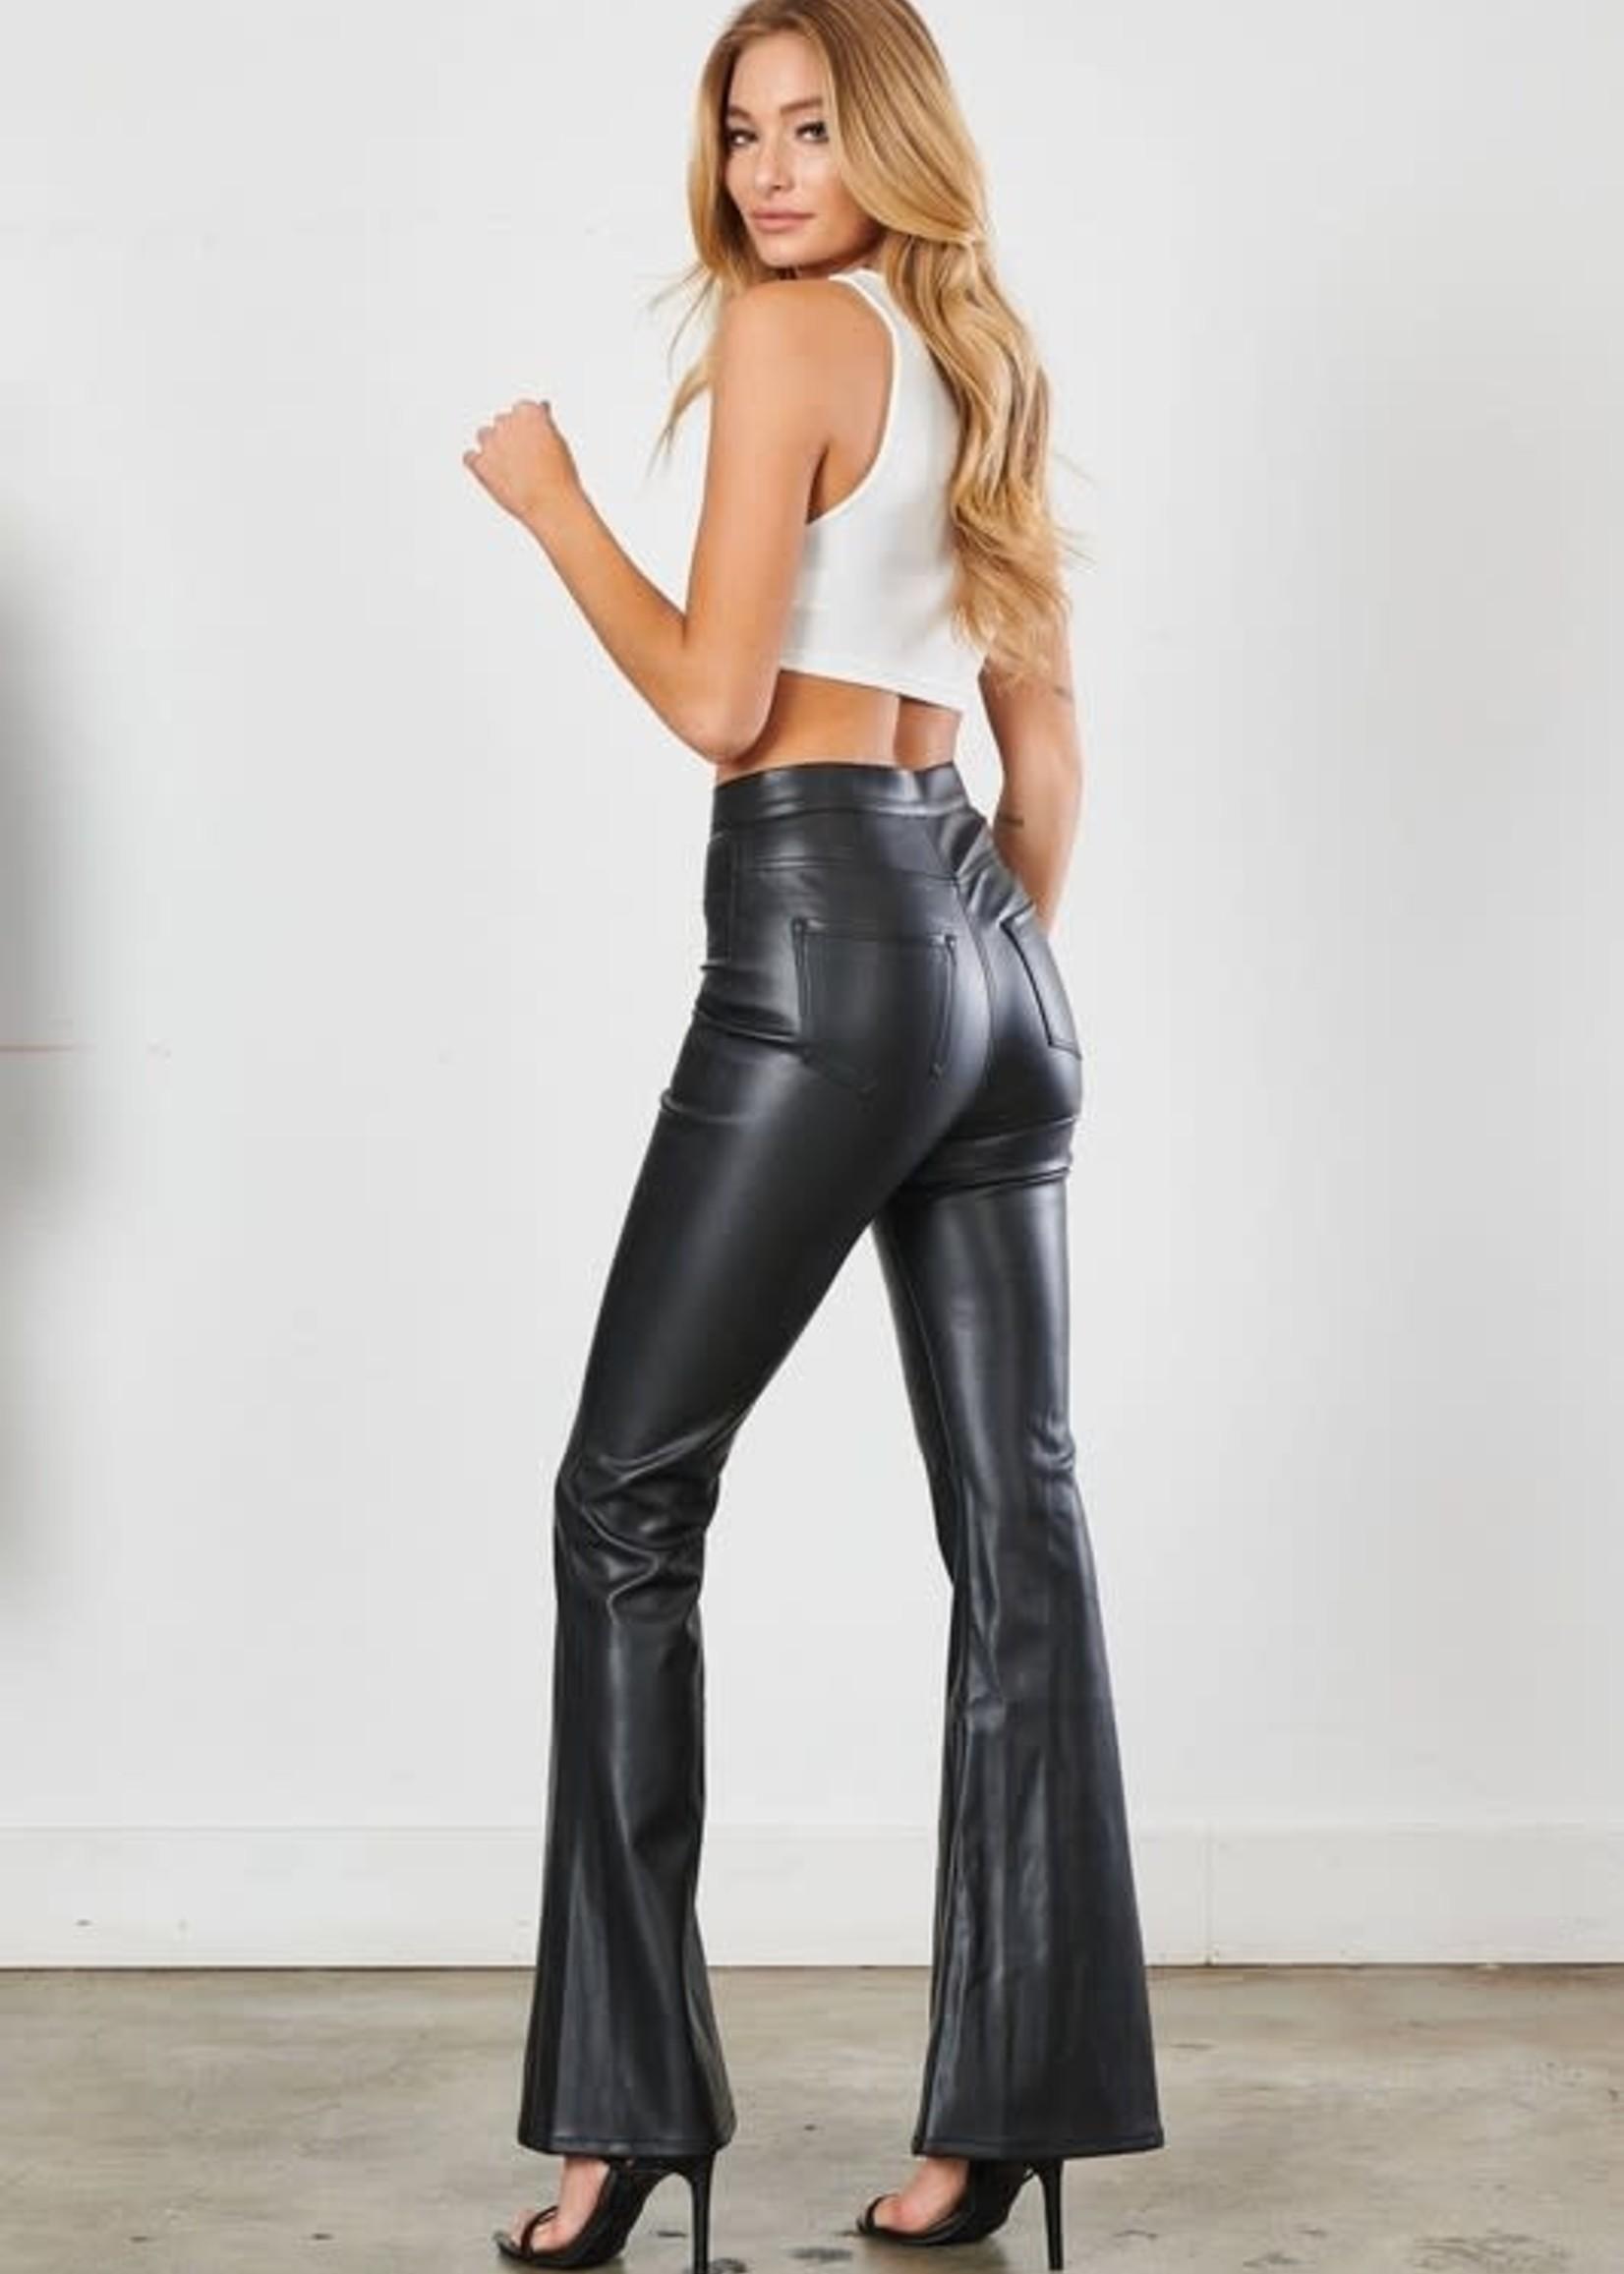 Black Leather Flares